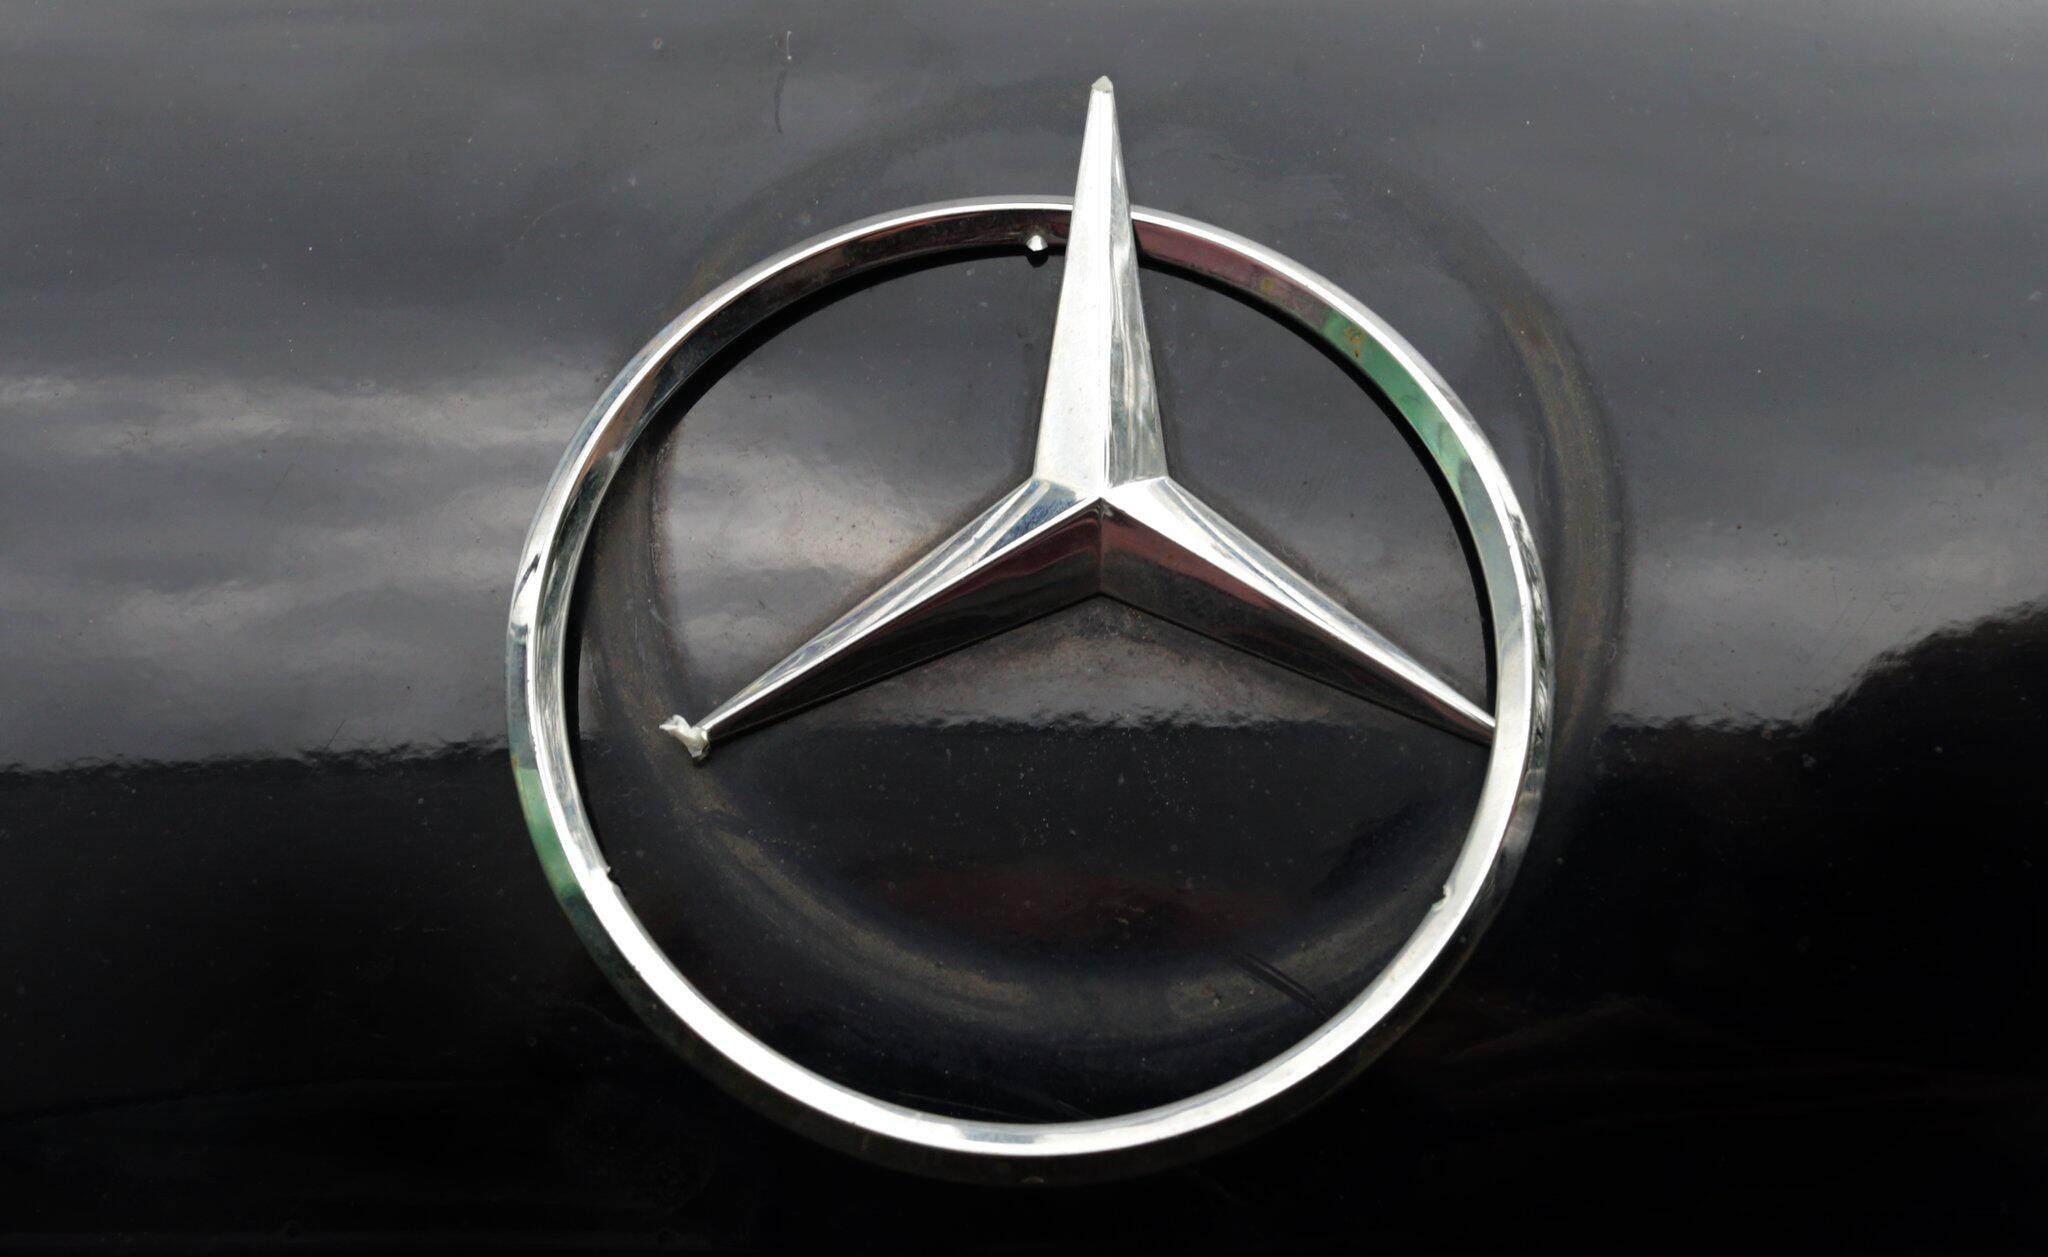 Bild zu Dieselskandal - Daimler